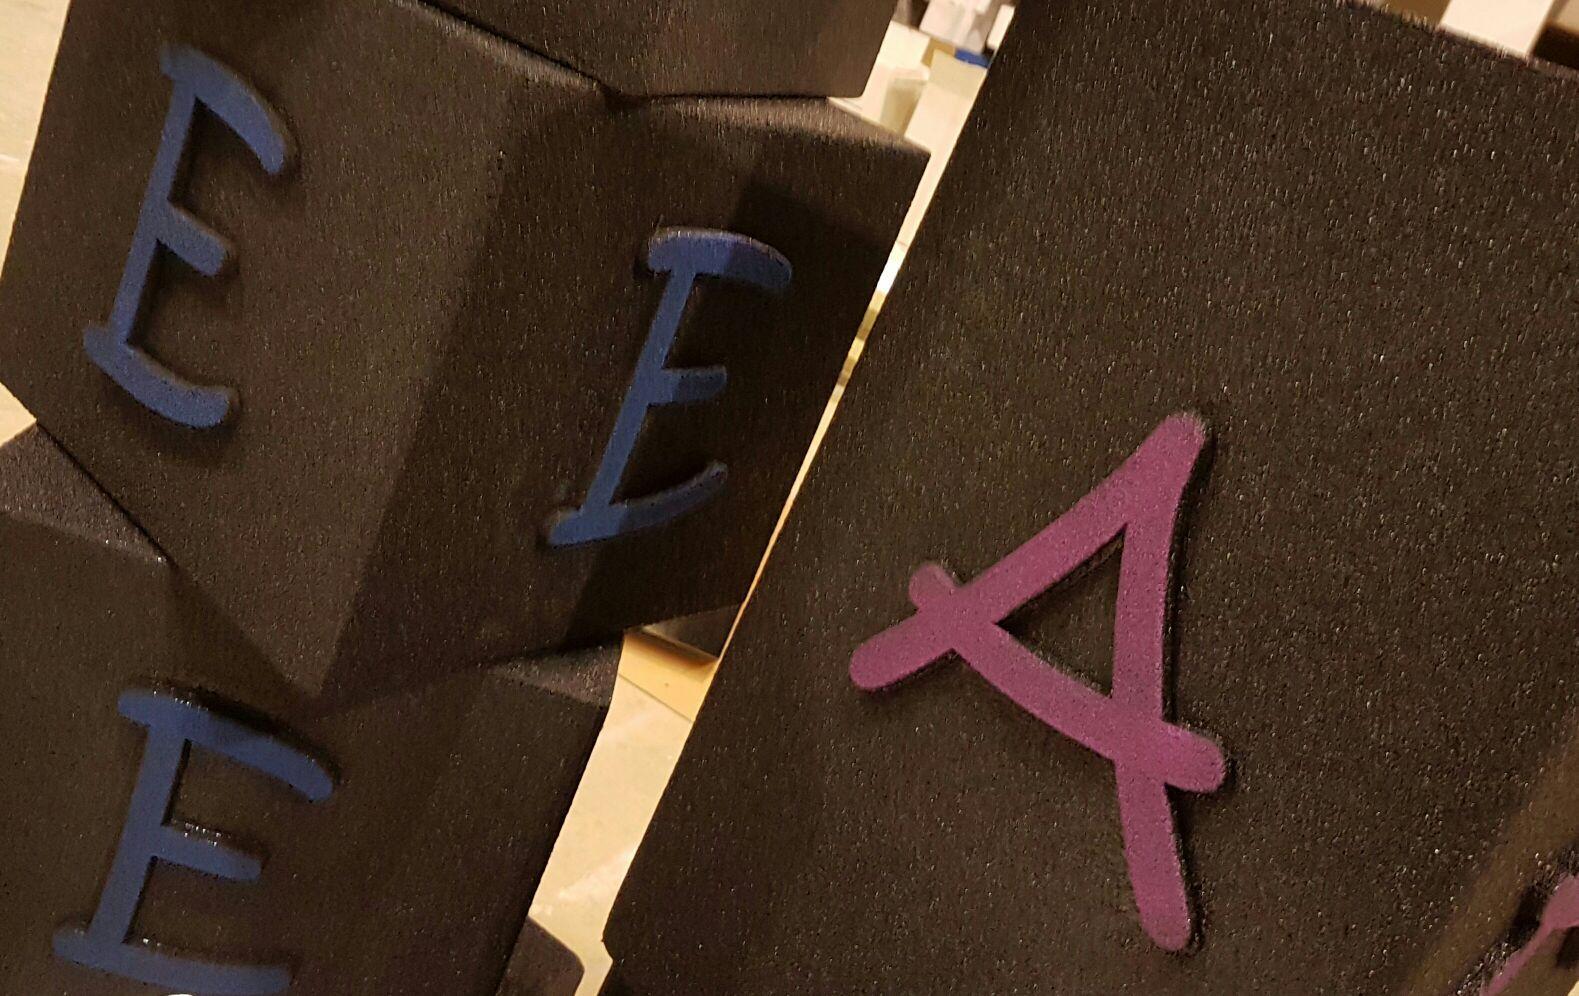 Cubi personalizzati #polymass #arredamento #design #custommade #bedifferentitaly #tuscany #madeinitaly #alphabet